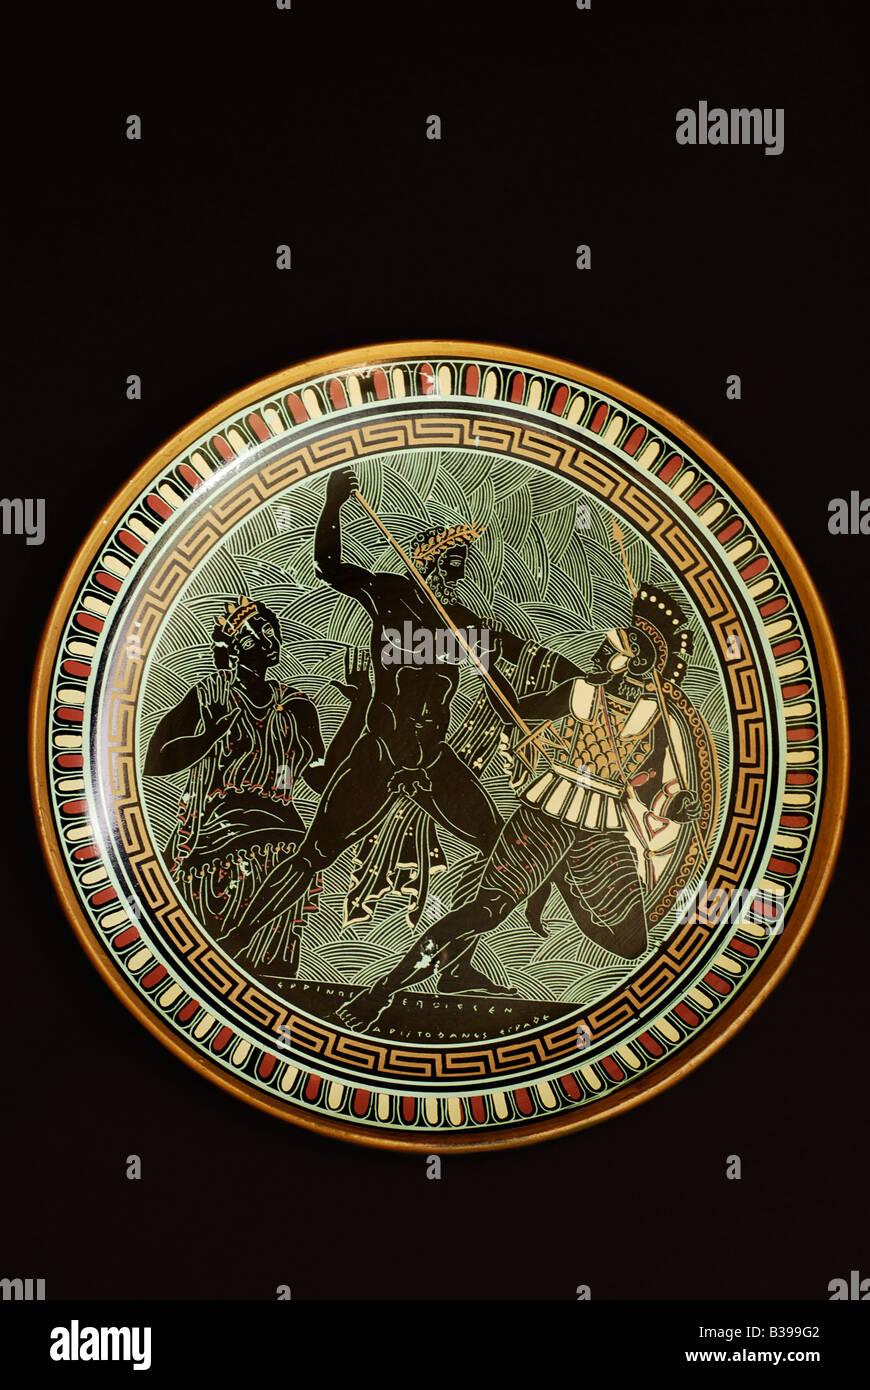 Hand made plate, Poseidon fights Polybotes - Stock Image